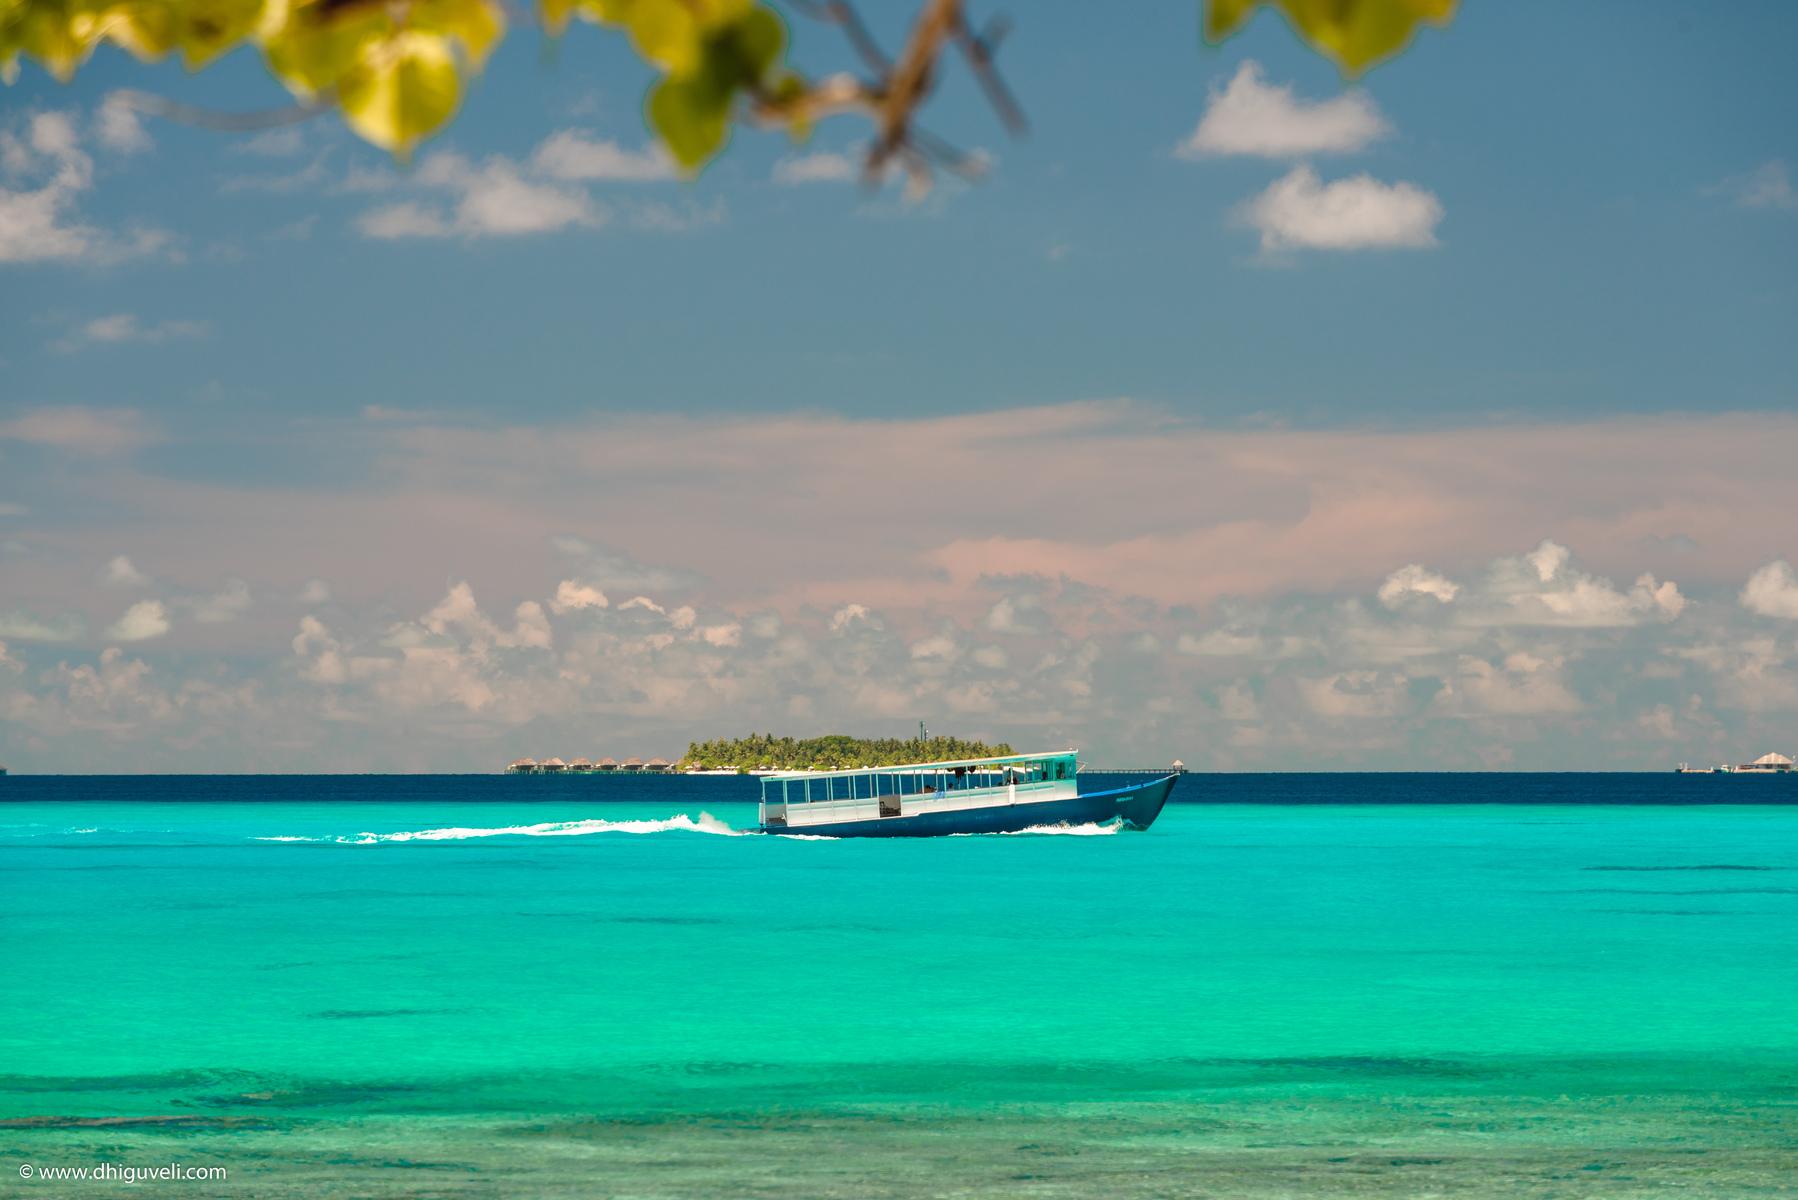 Hotel Dhiguveli Maldives